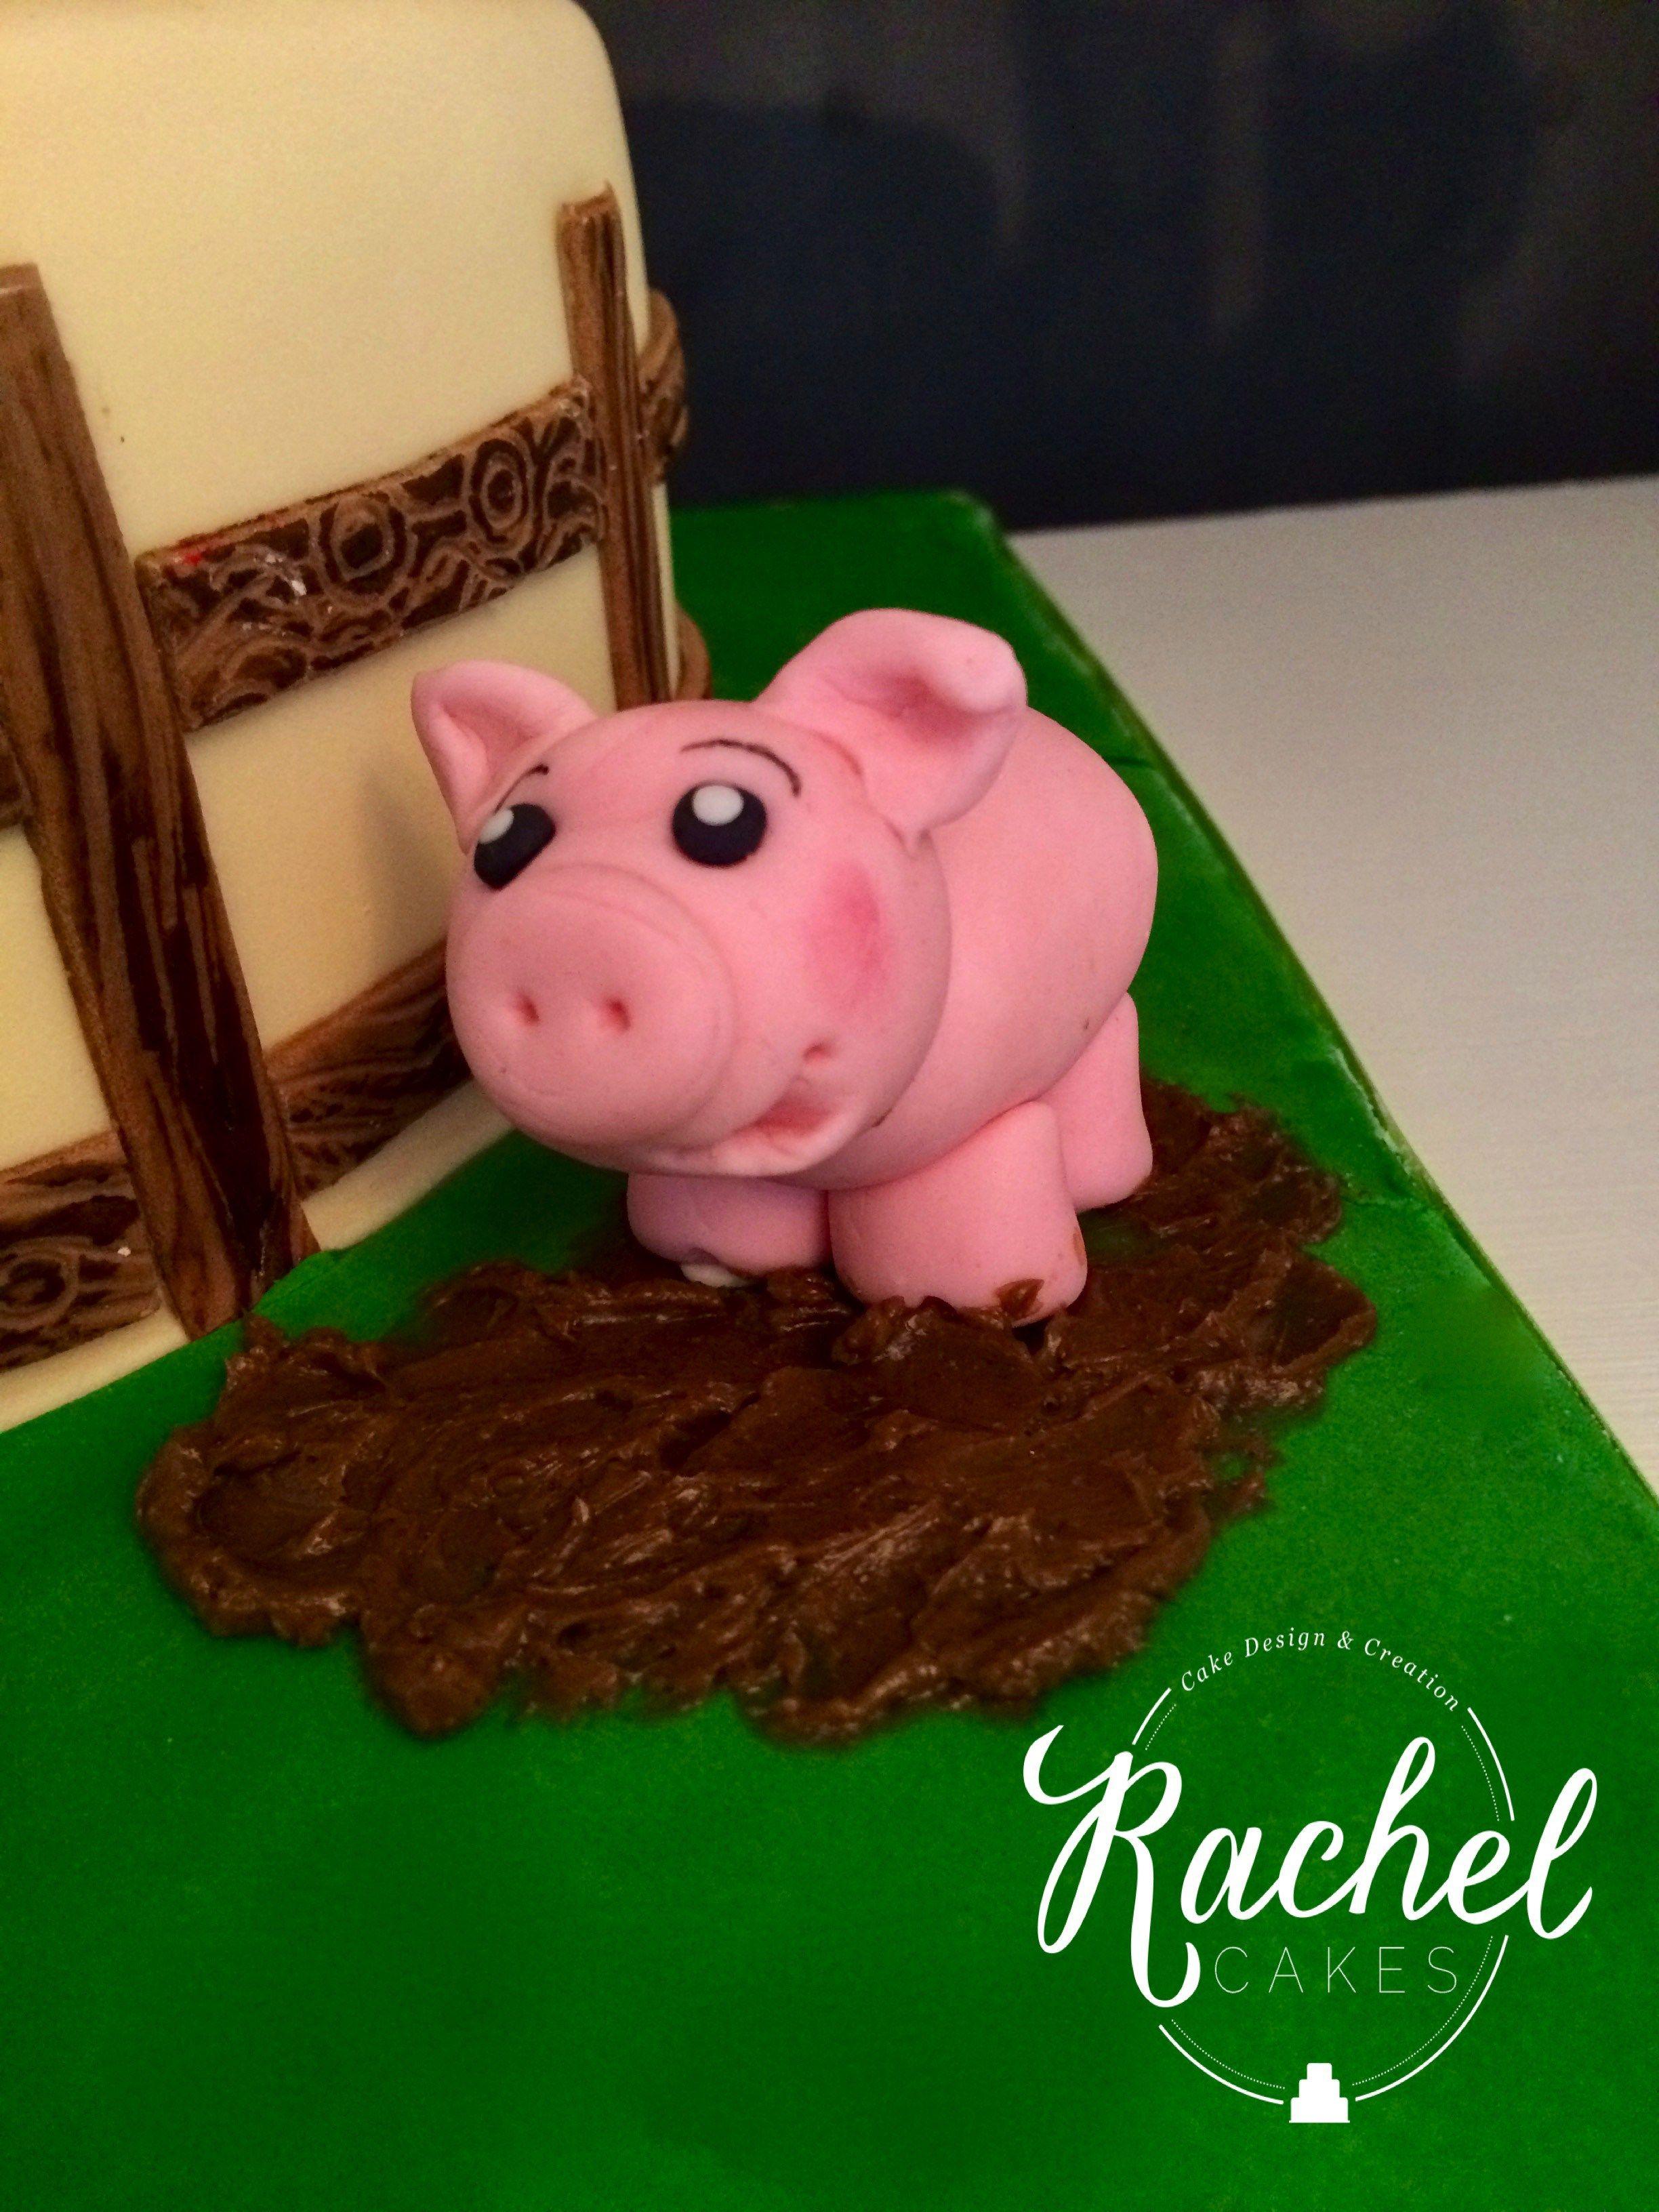 Blog Whats New Rachelcakes Themedsculptured Cakes